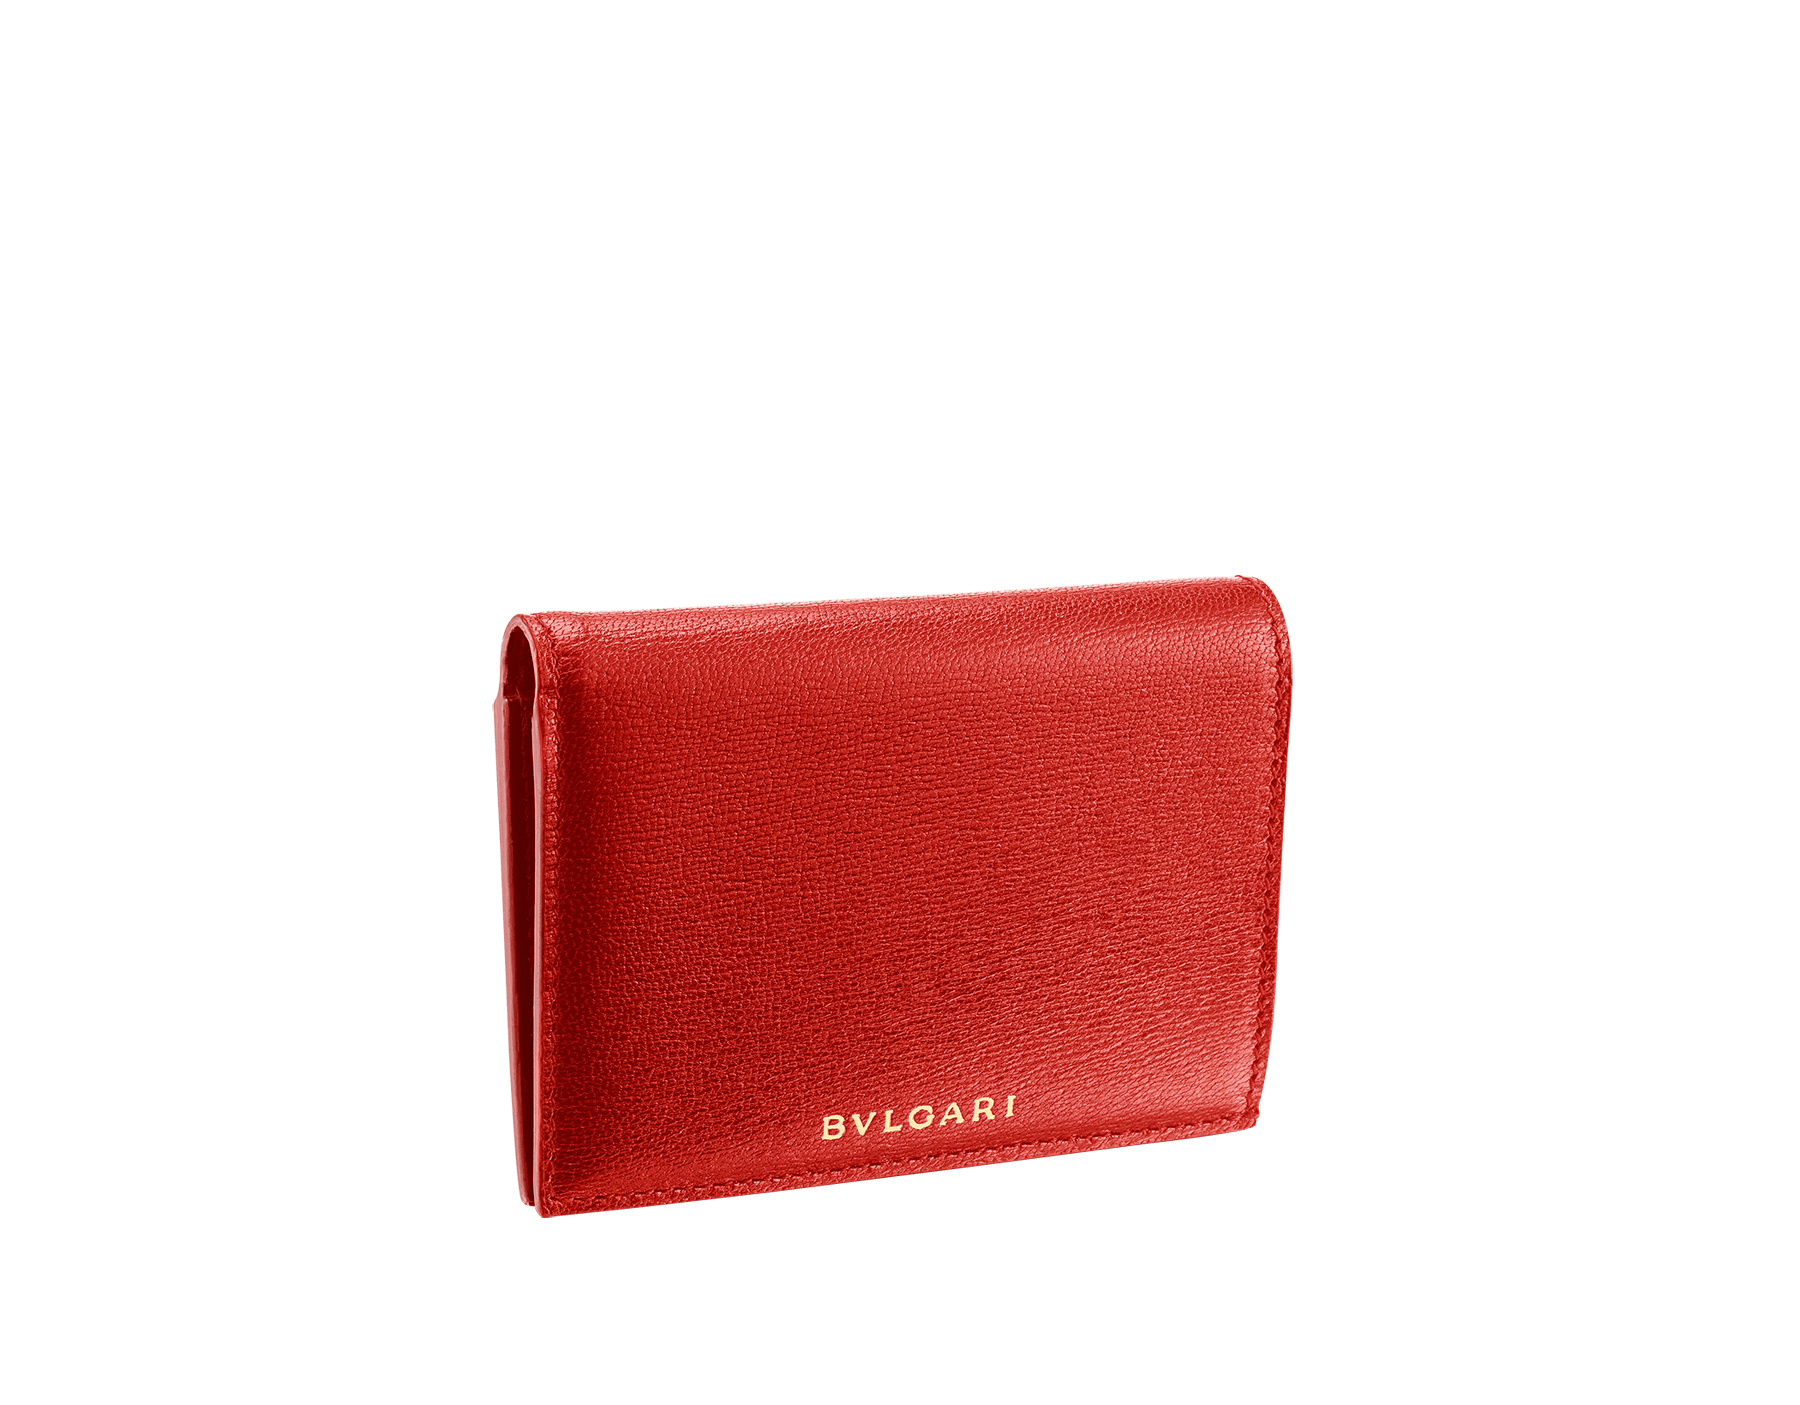 """B.zero1""胭脂碧玉色和红宝石色山羊皮双折叠信用卡夹。浅金镀金黄铜经典B.zero1吊饰。 289151 image 1"